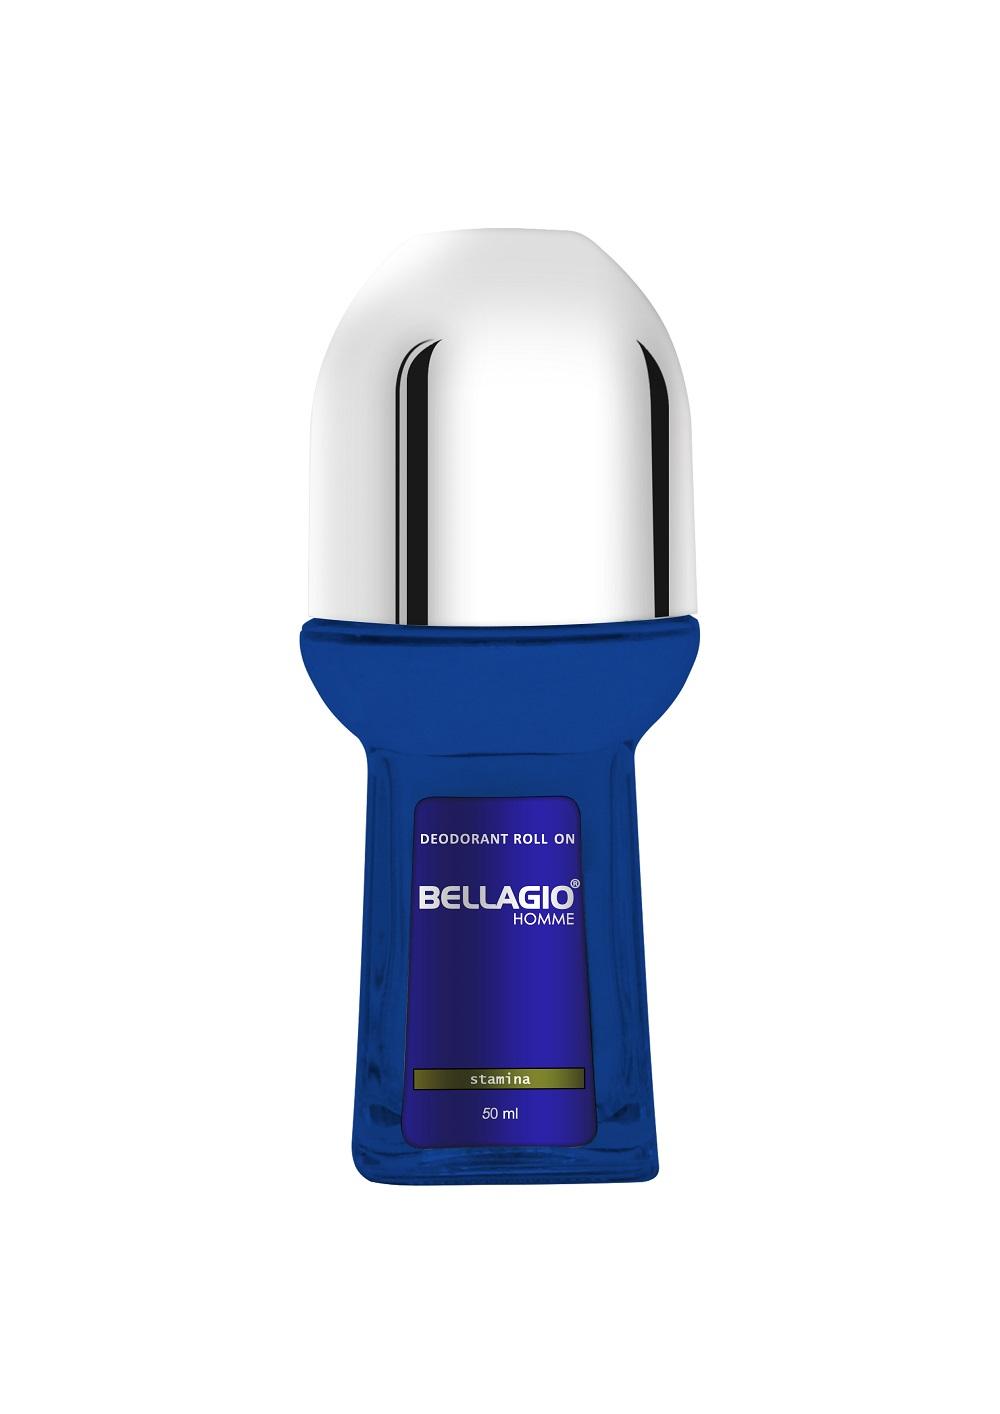 Bellagio Roll On Blue Glass 50ml – Stamina